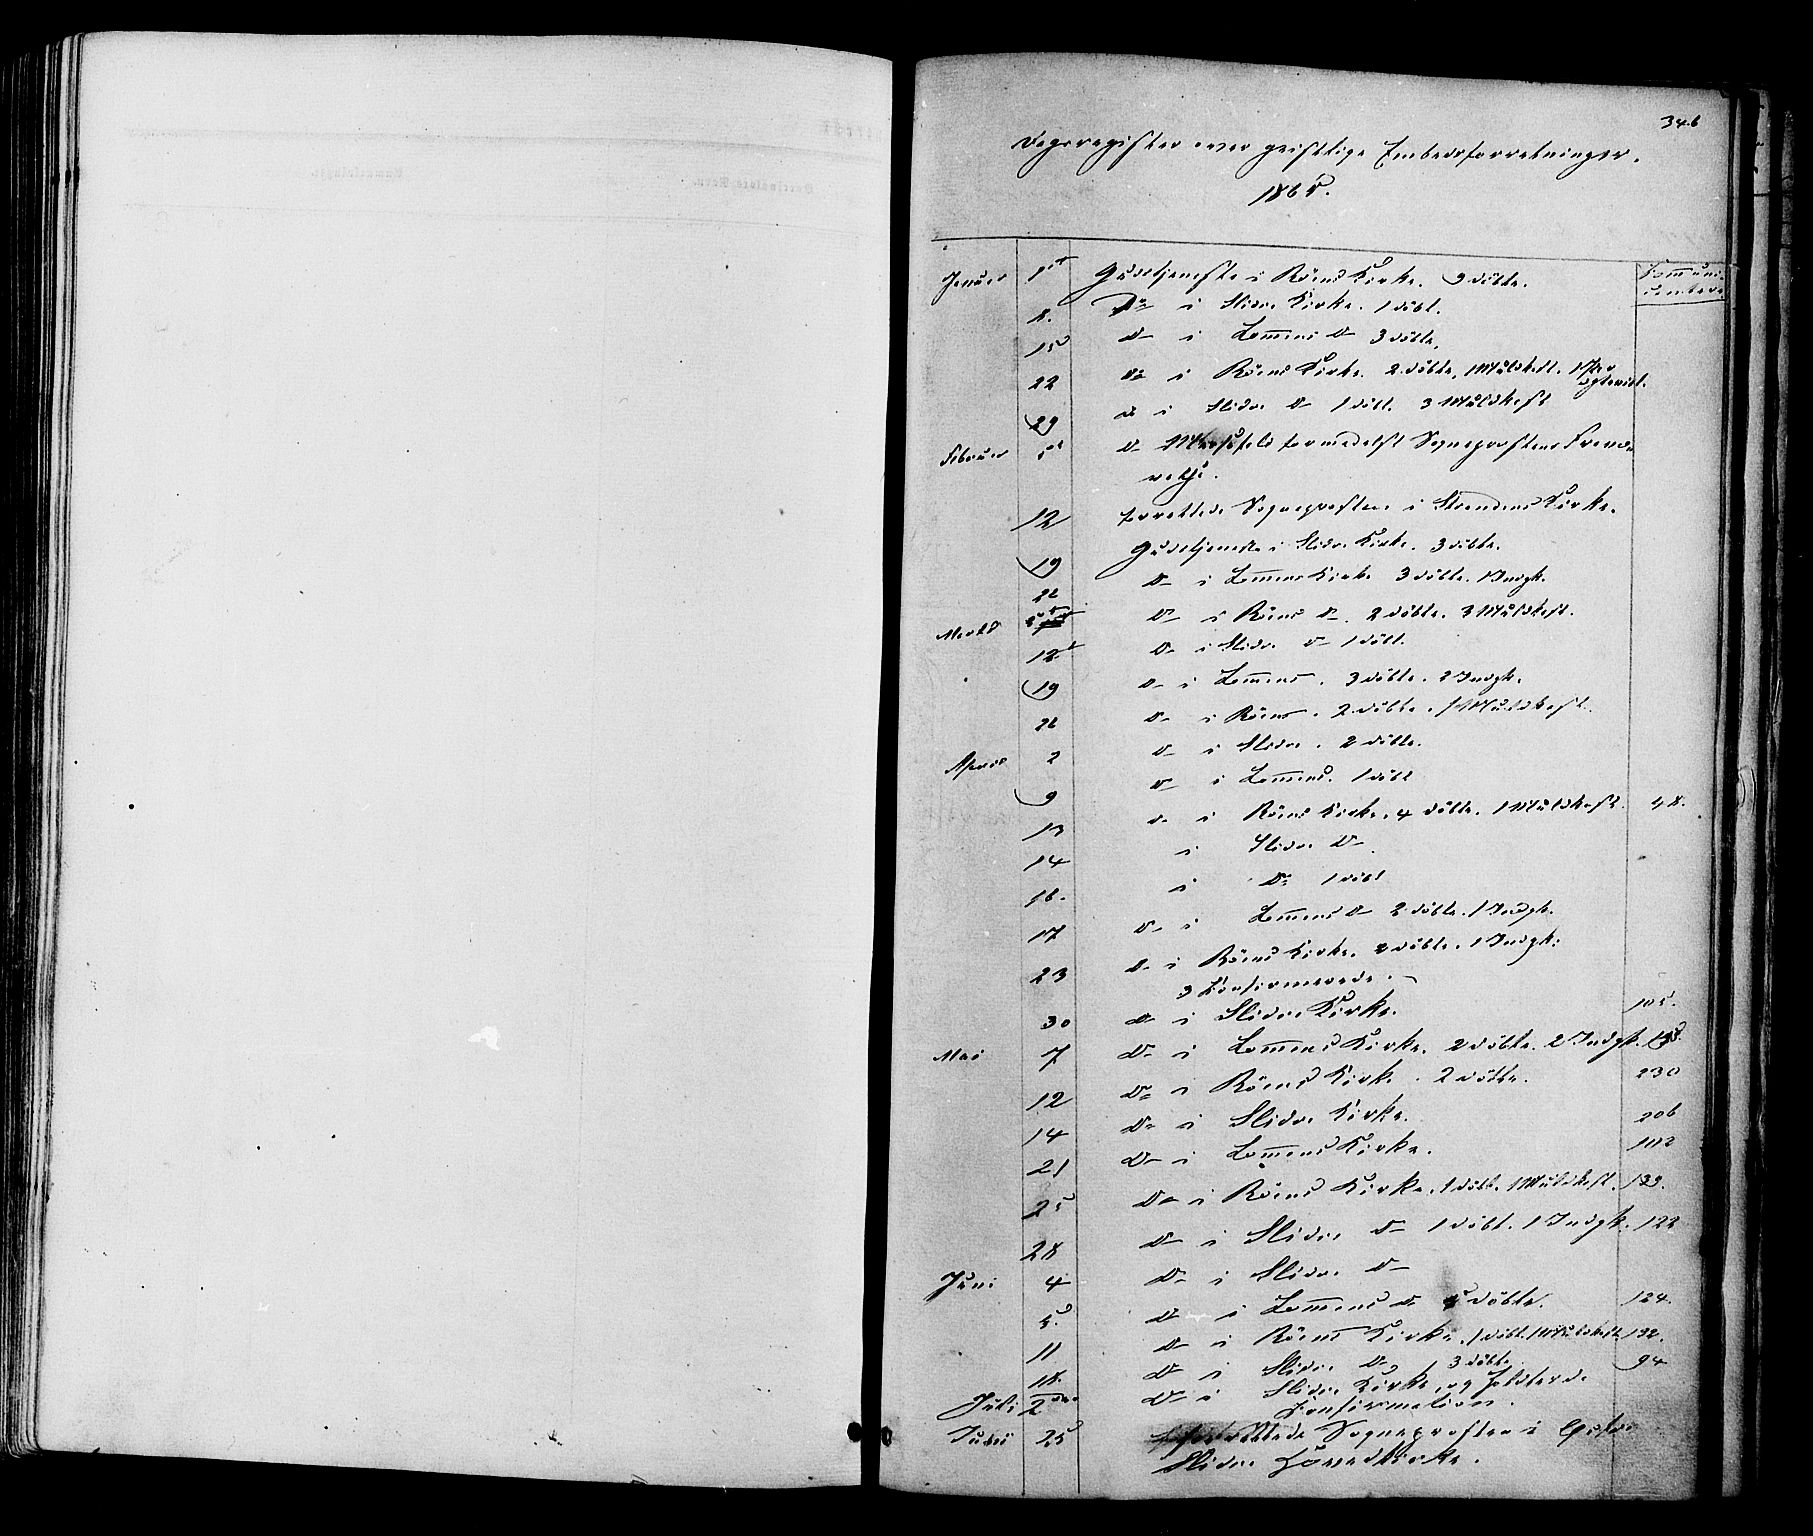 SAH, Vestre Slidre prestekontor, Ministerialbok nr. 3, 1865-1880, s. 346